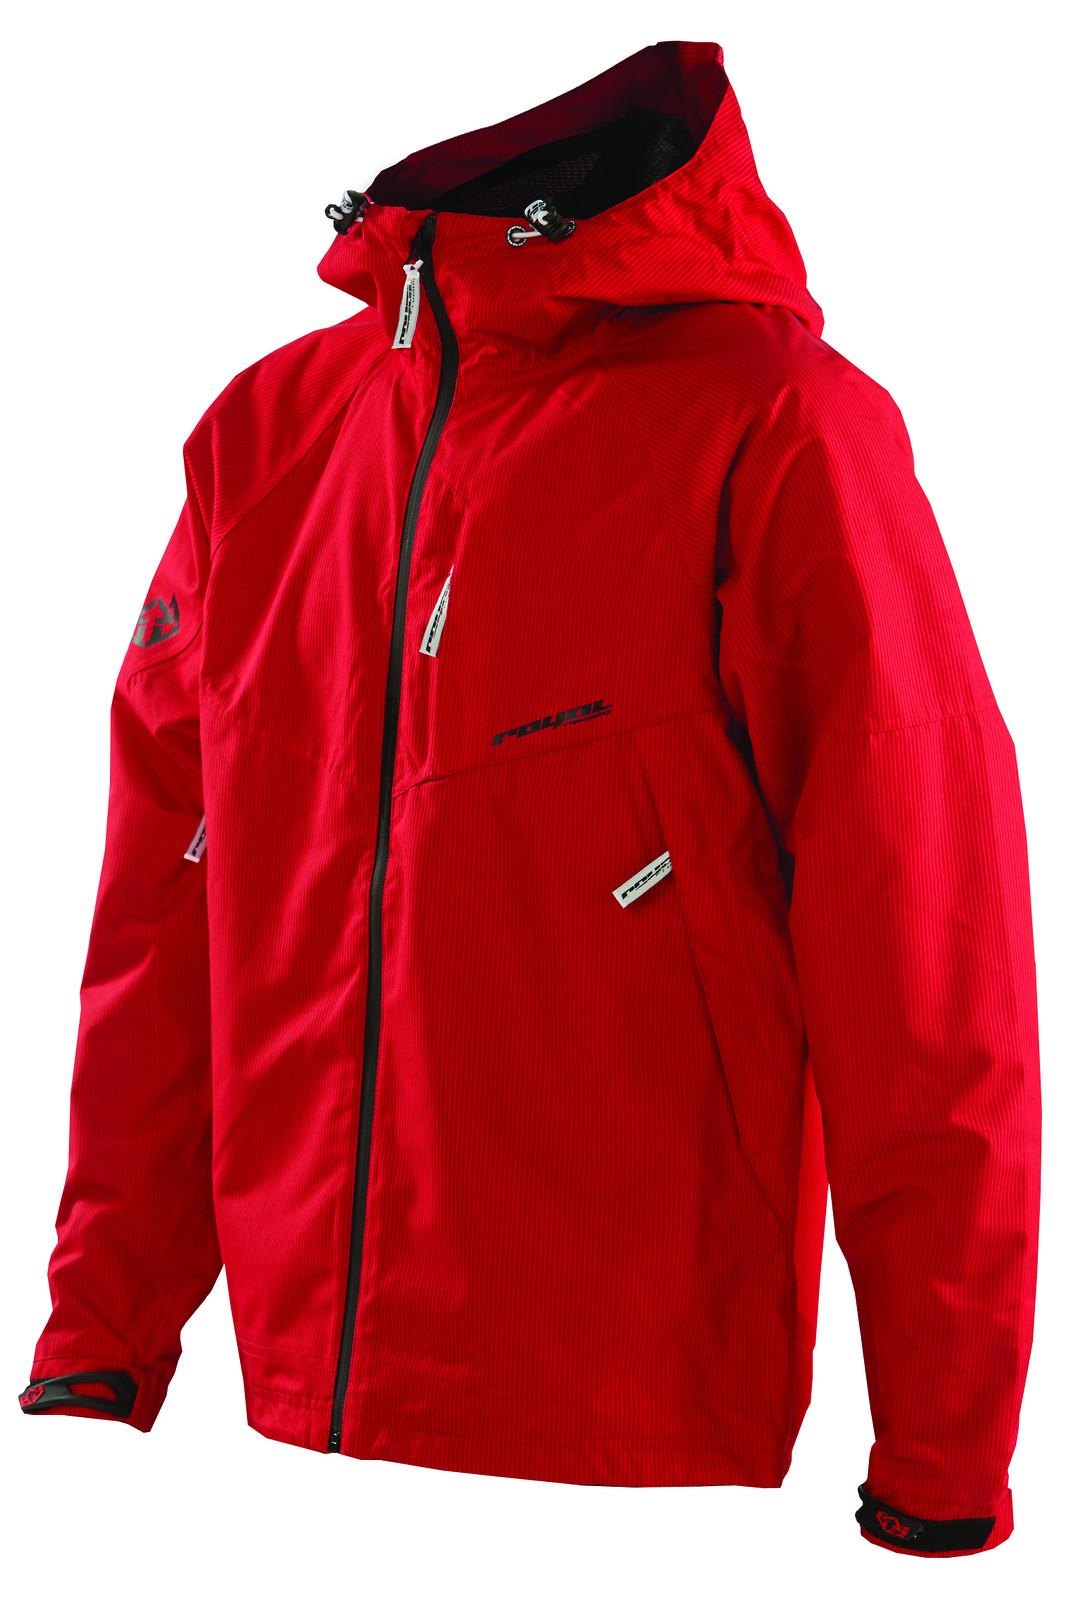 Royal 2014 Matrix Jacket matrix red jacket-f